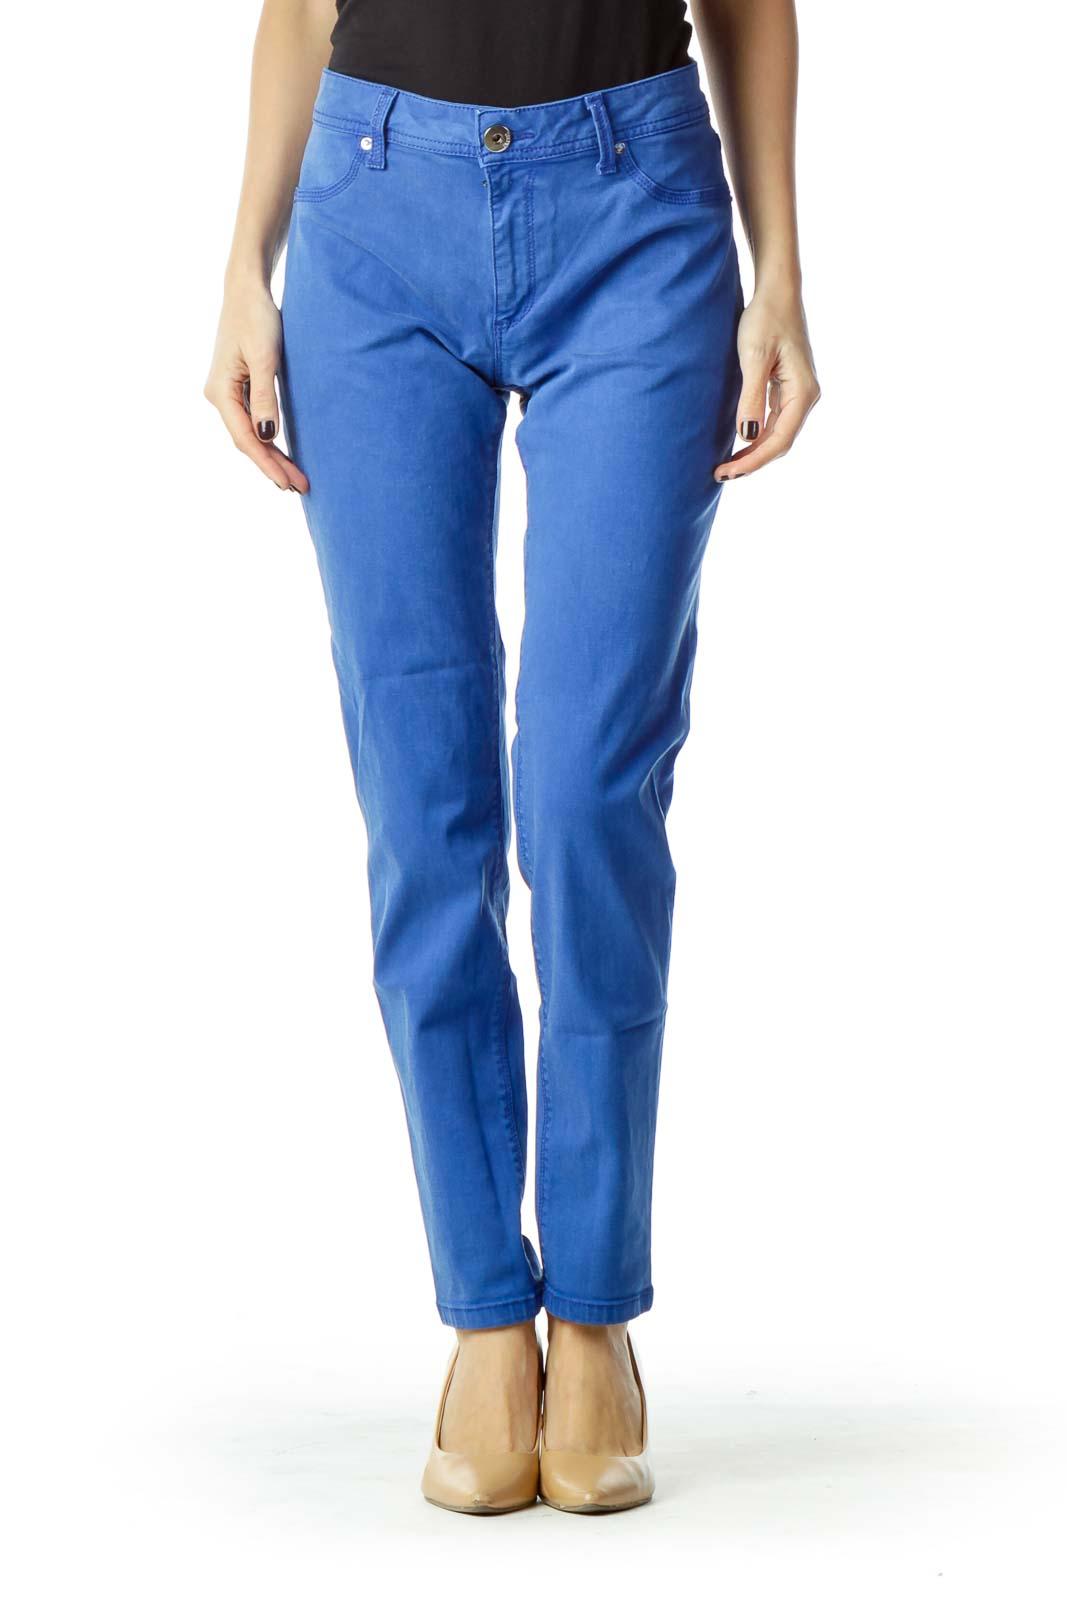 Royal Blue Skinny Jean